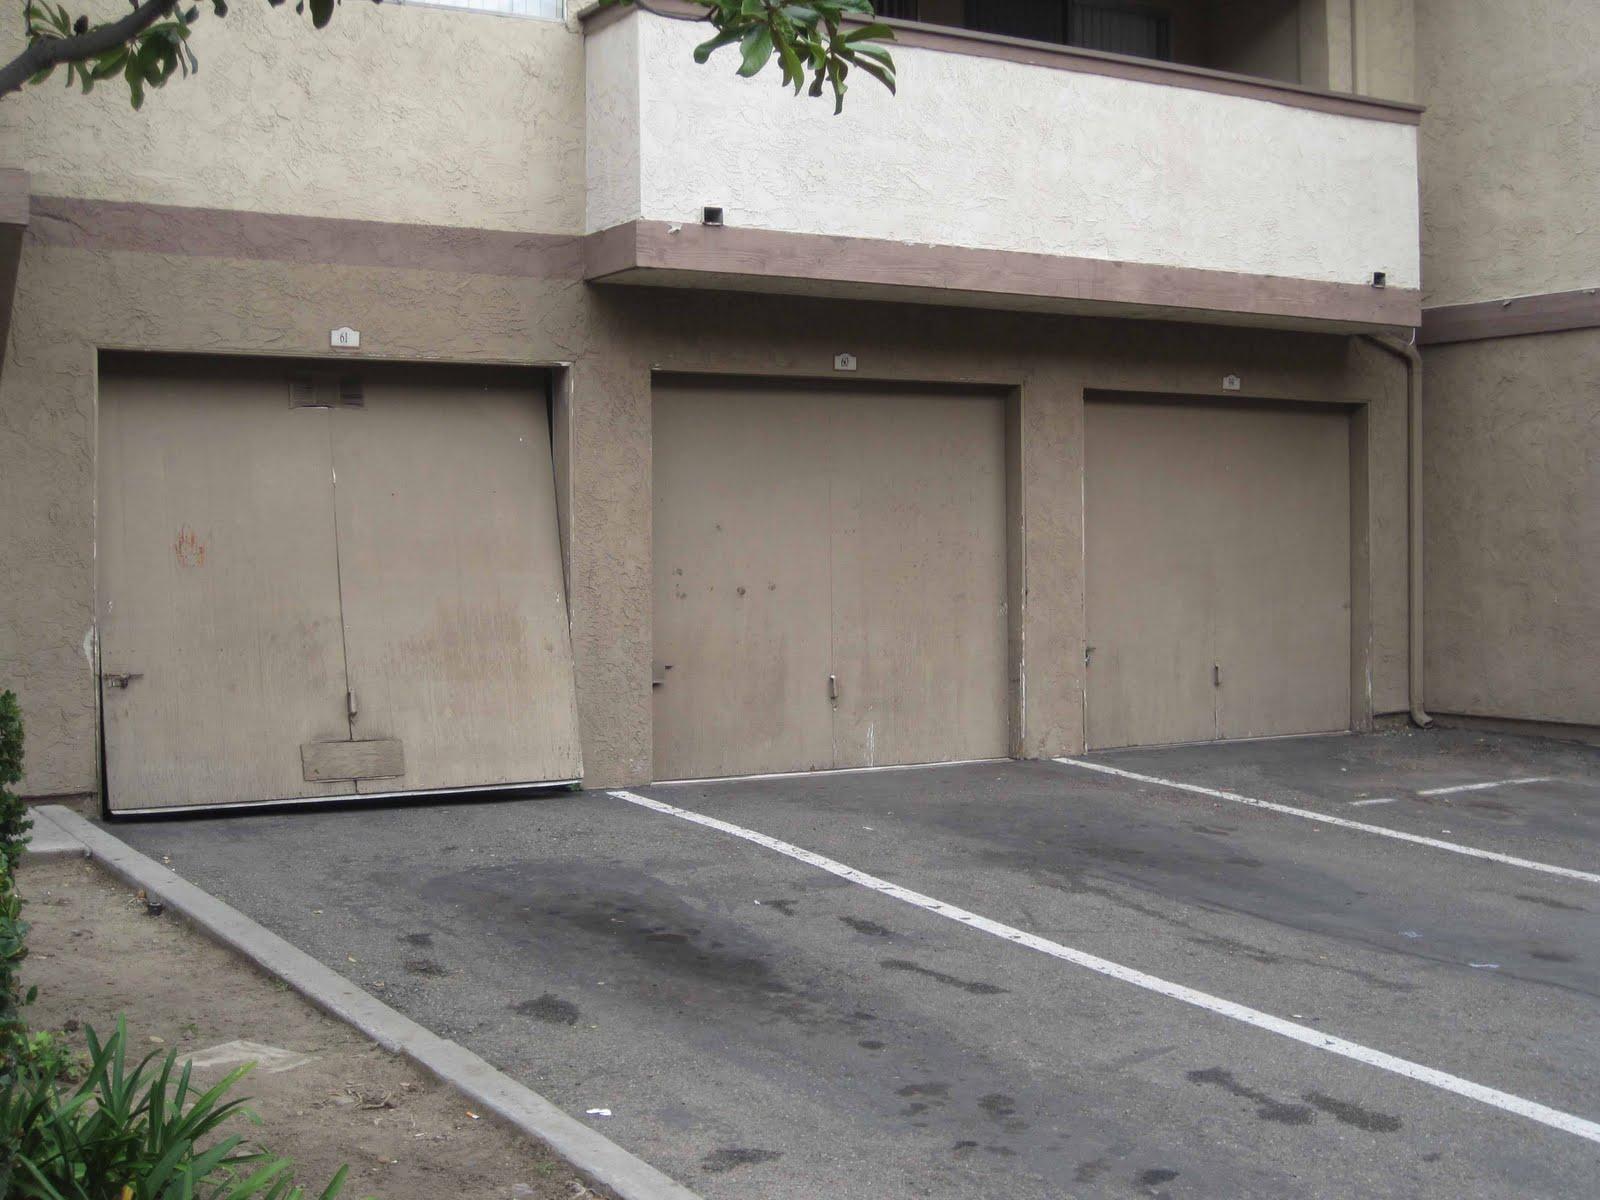 Jury Verdict Garage Door Falls On Tenant But Landlord Says Injury